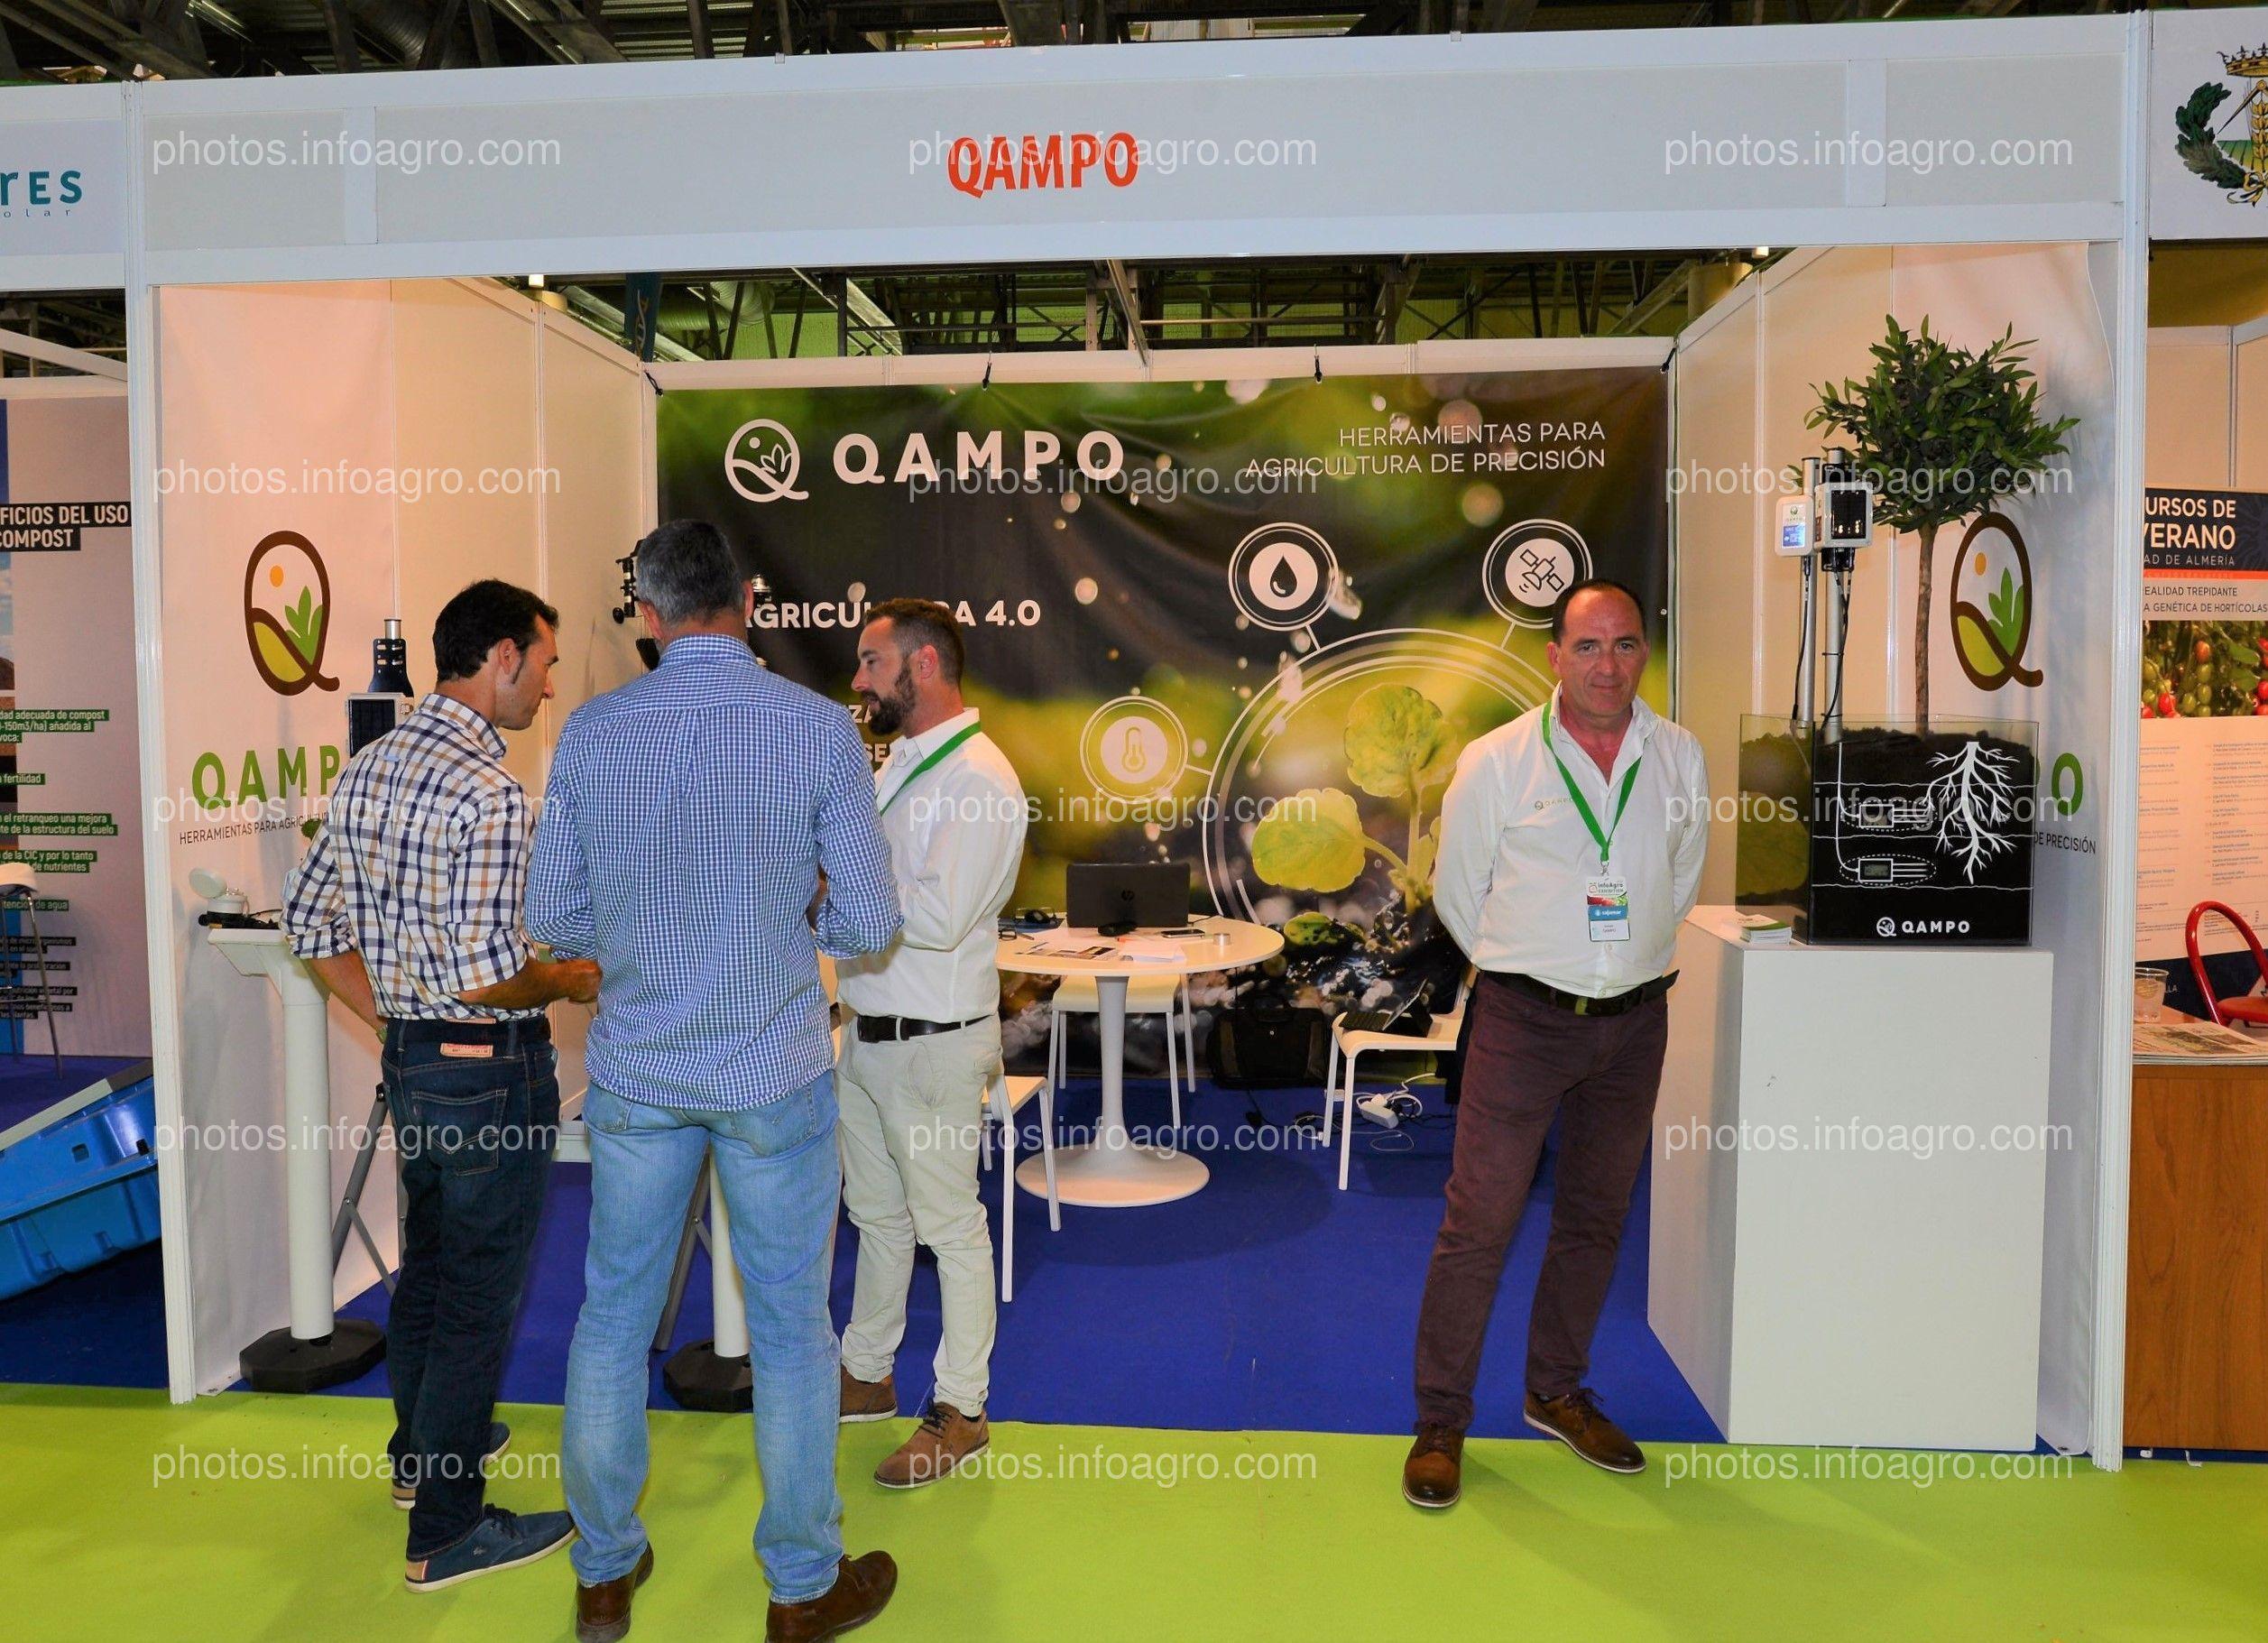 Qampo - Stand Infoagro Exhibition